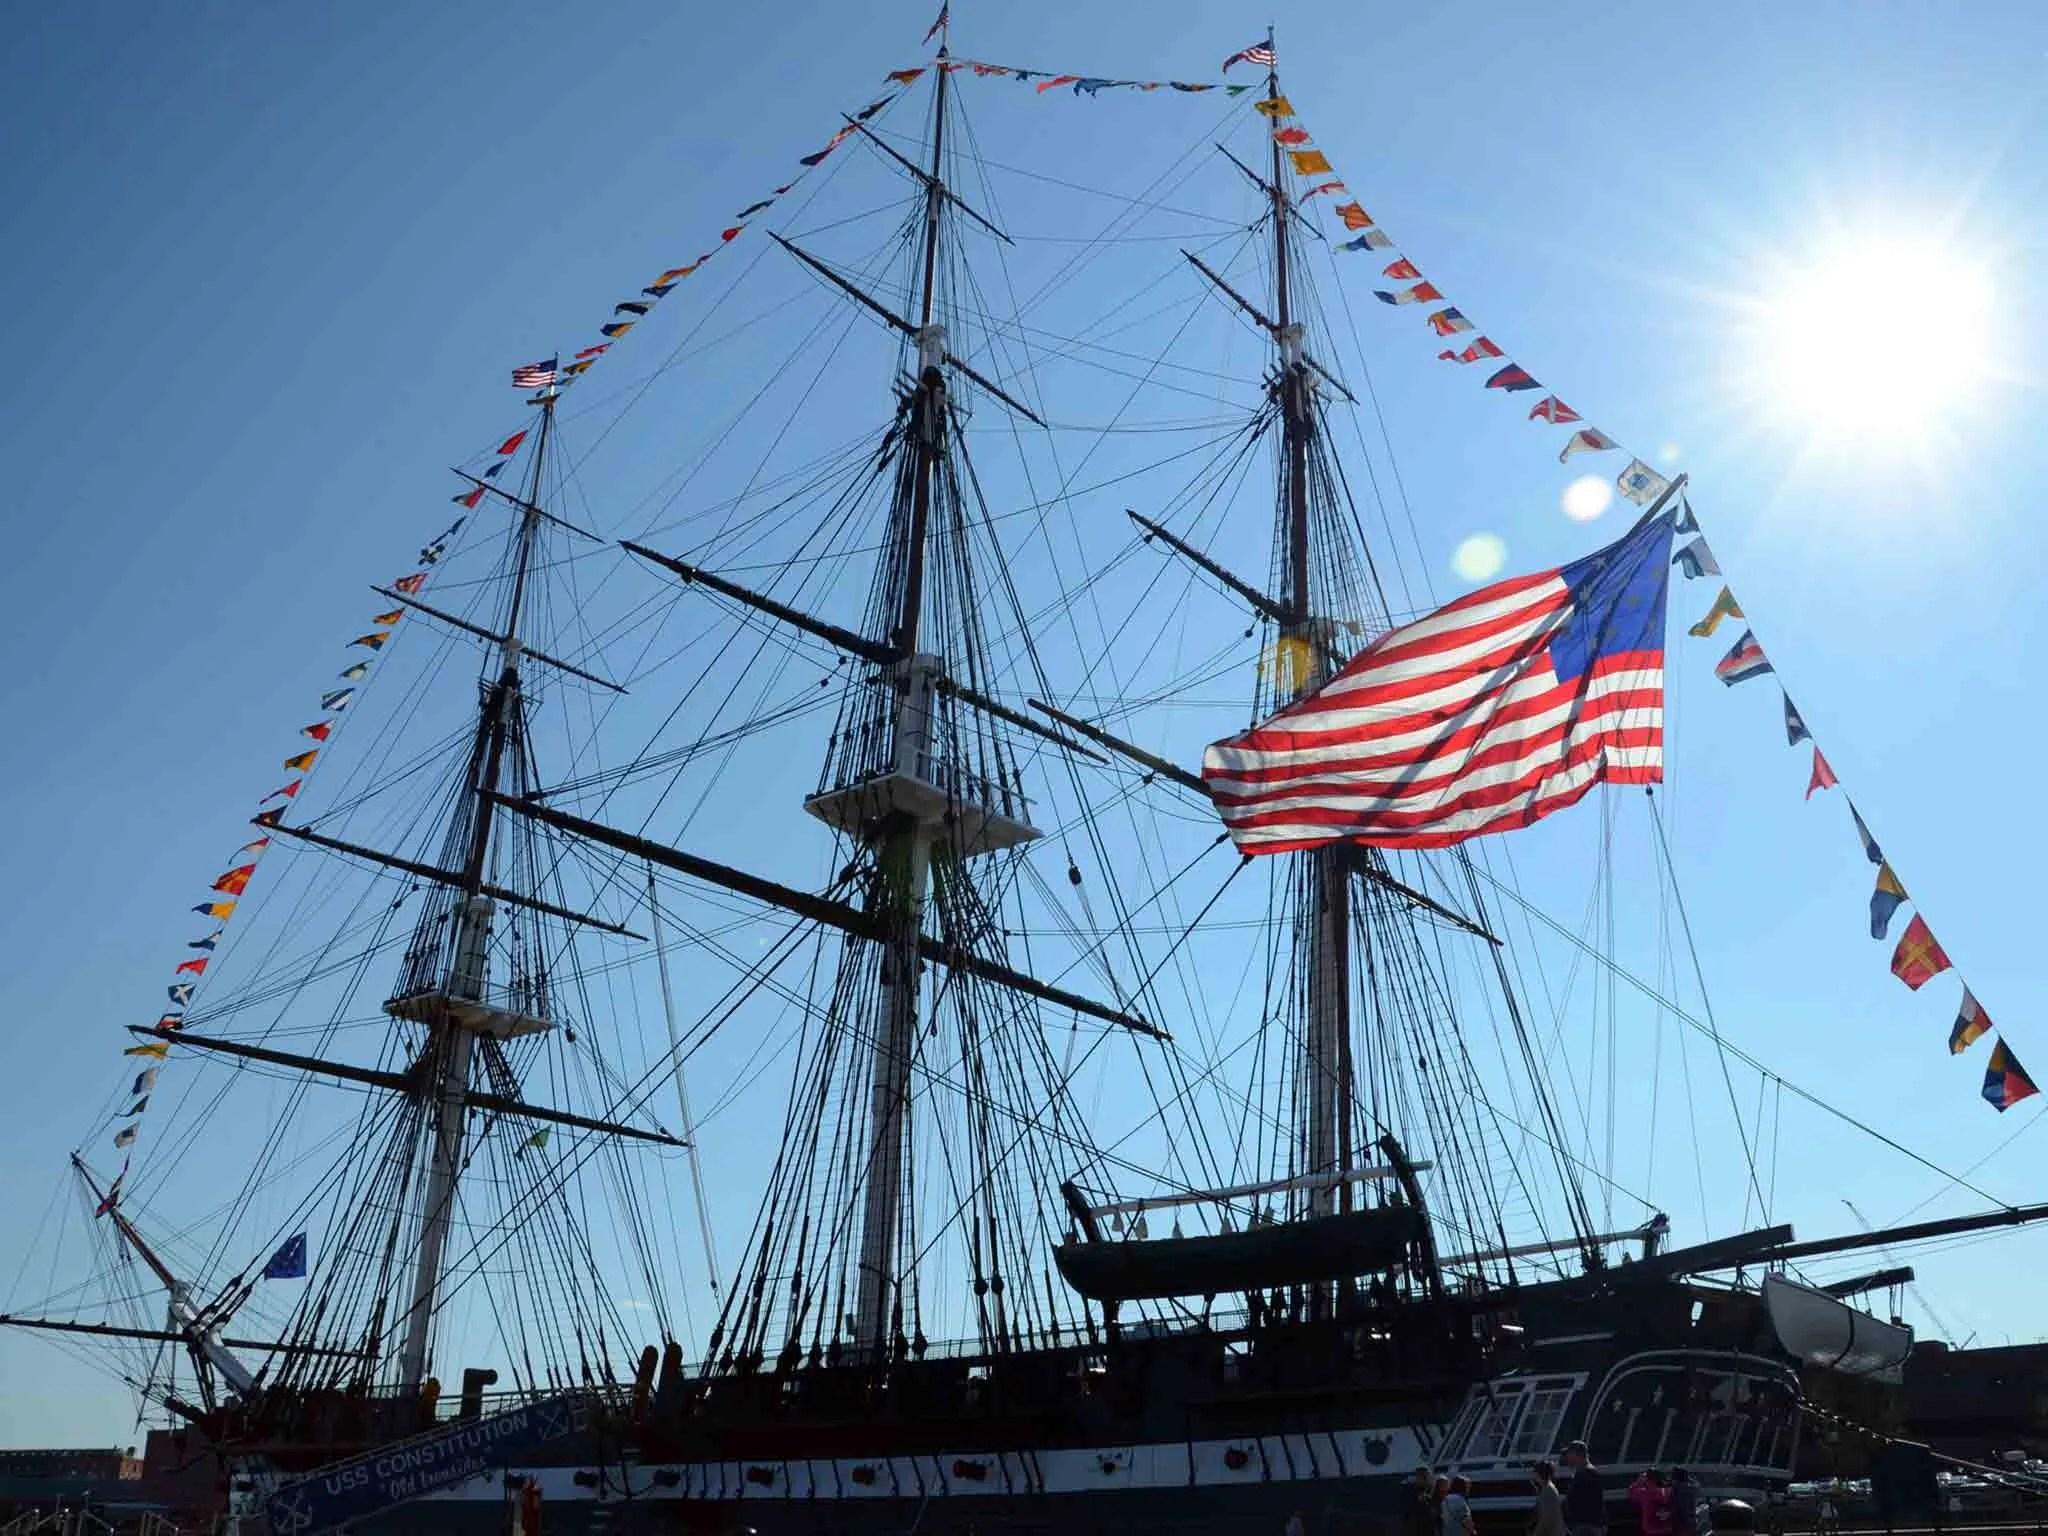 Us S Constitution Boston Massachusetts